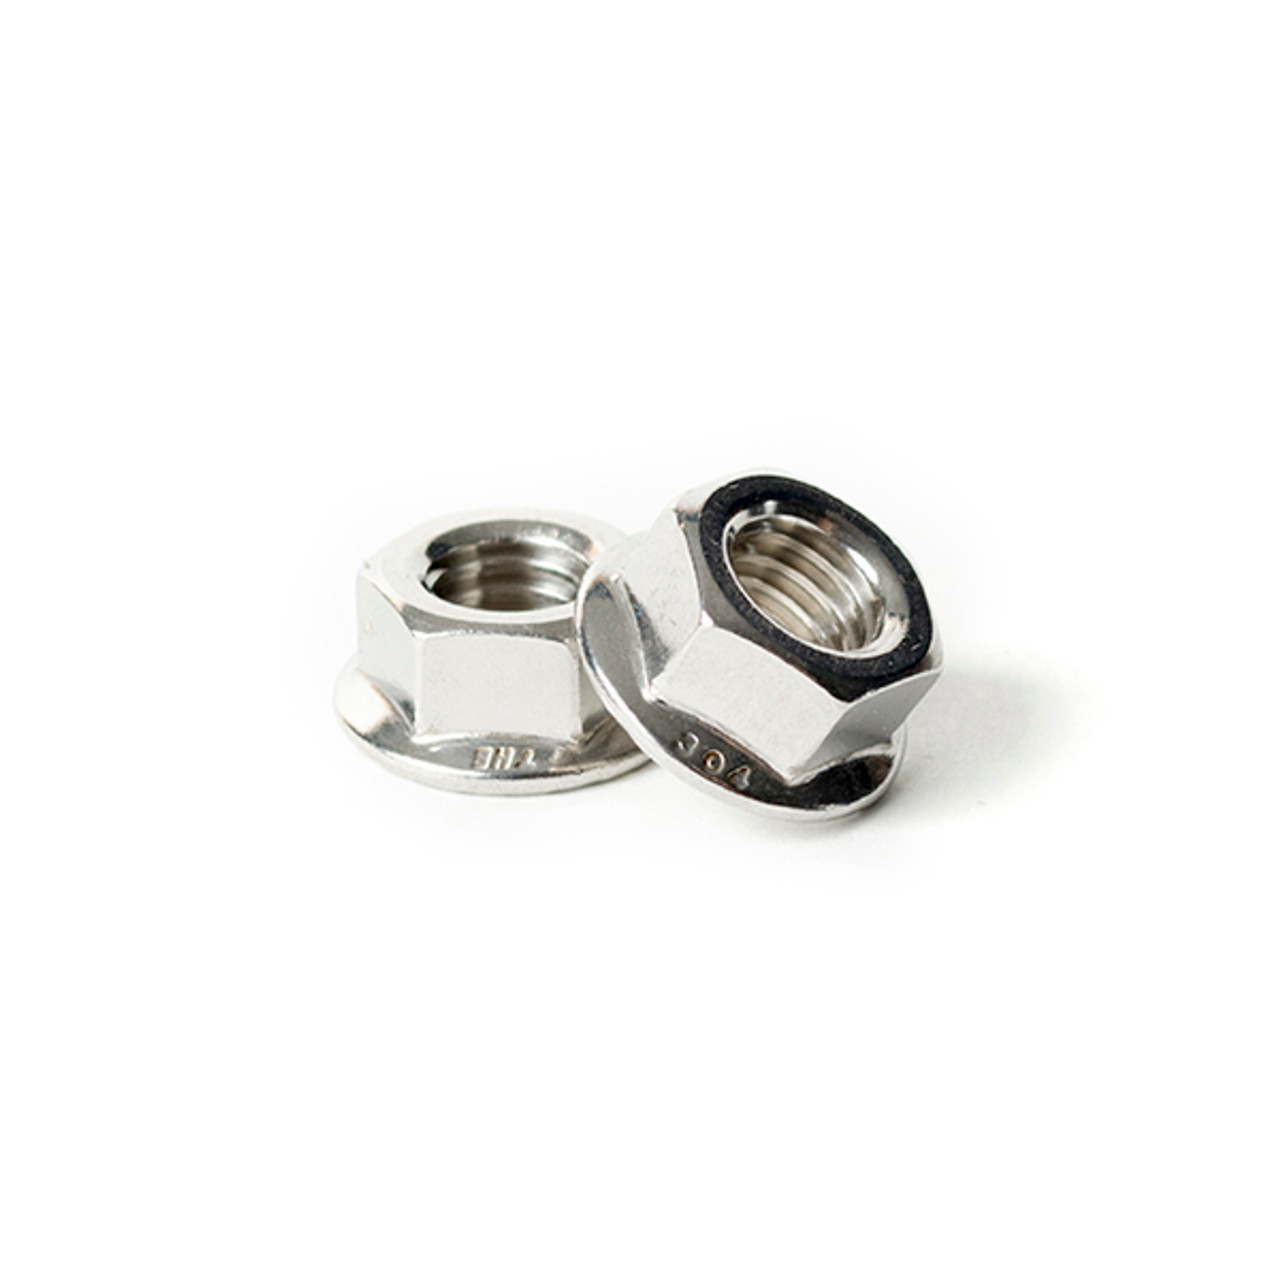 5/16-24 Serrated Flange Lock Nut 18-8 Stainless Steel